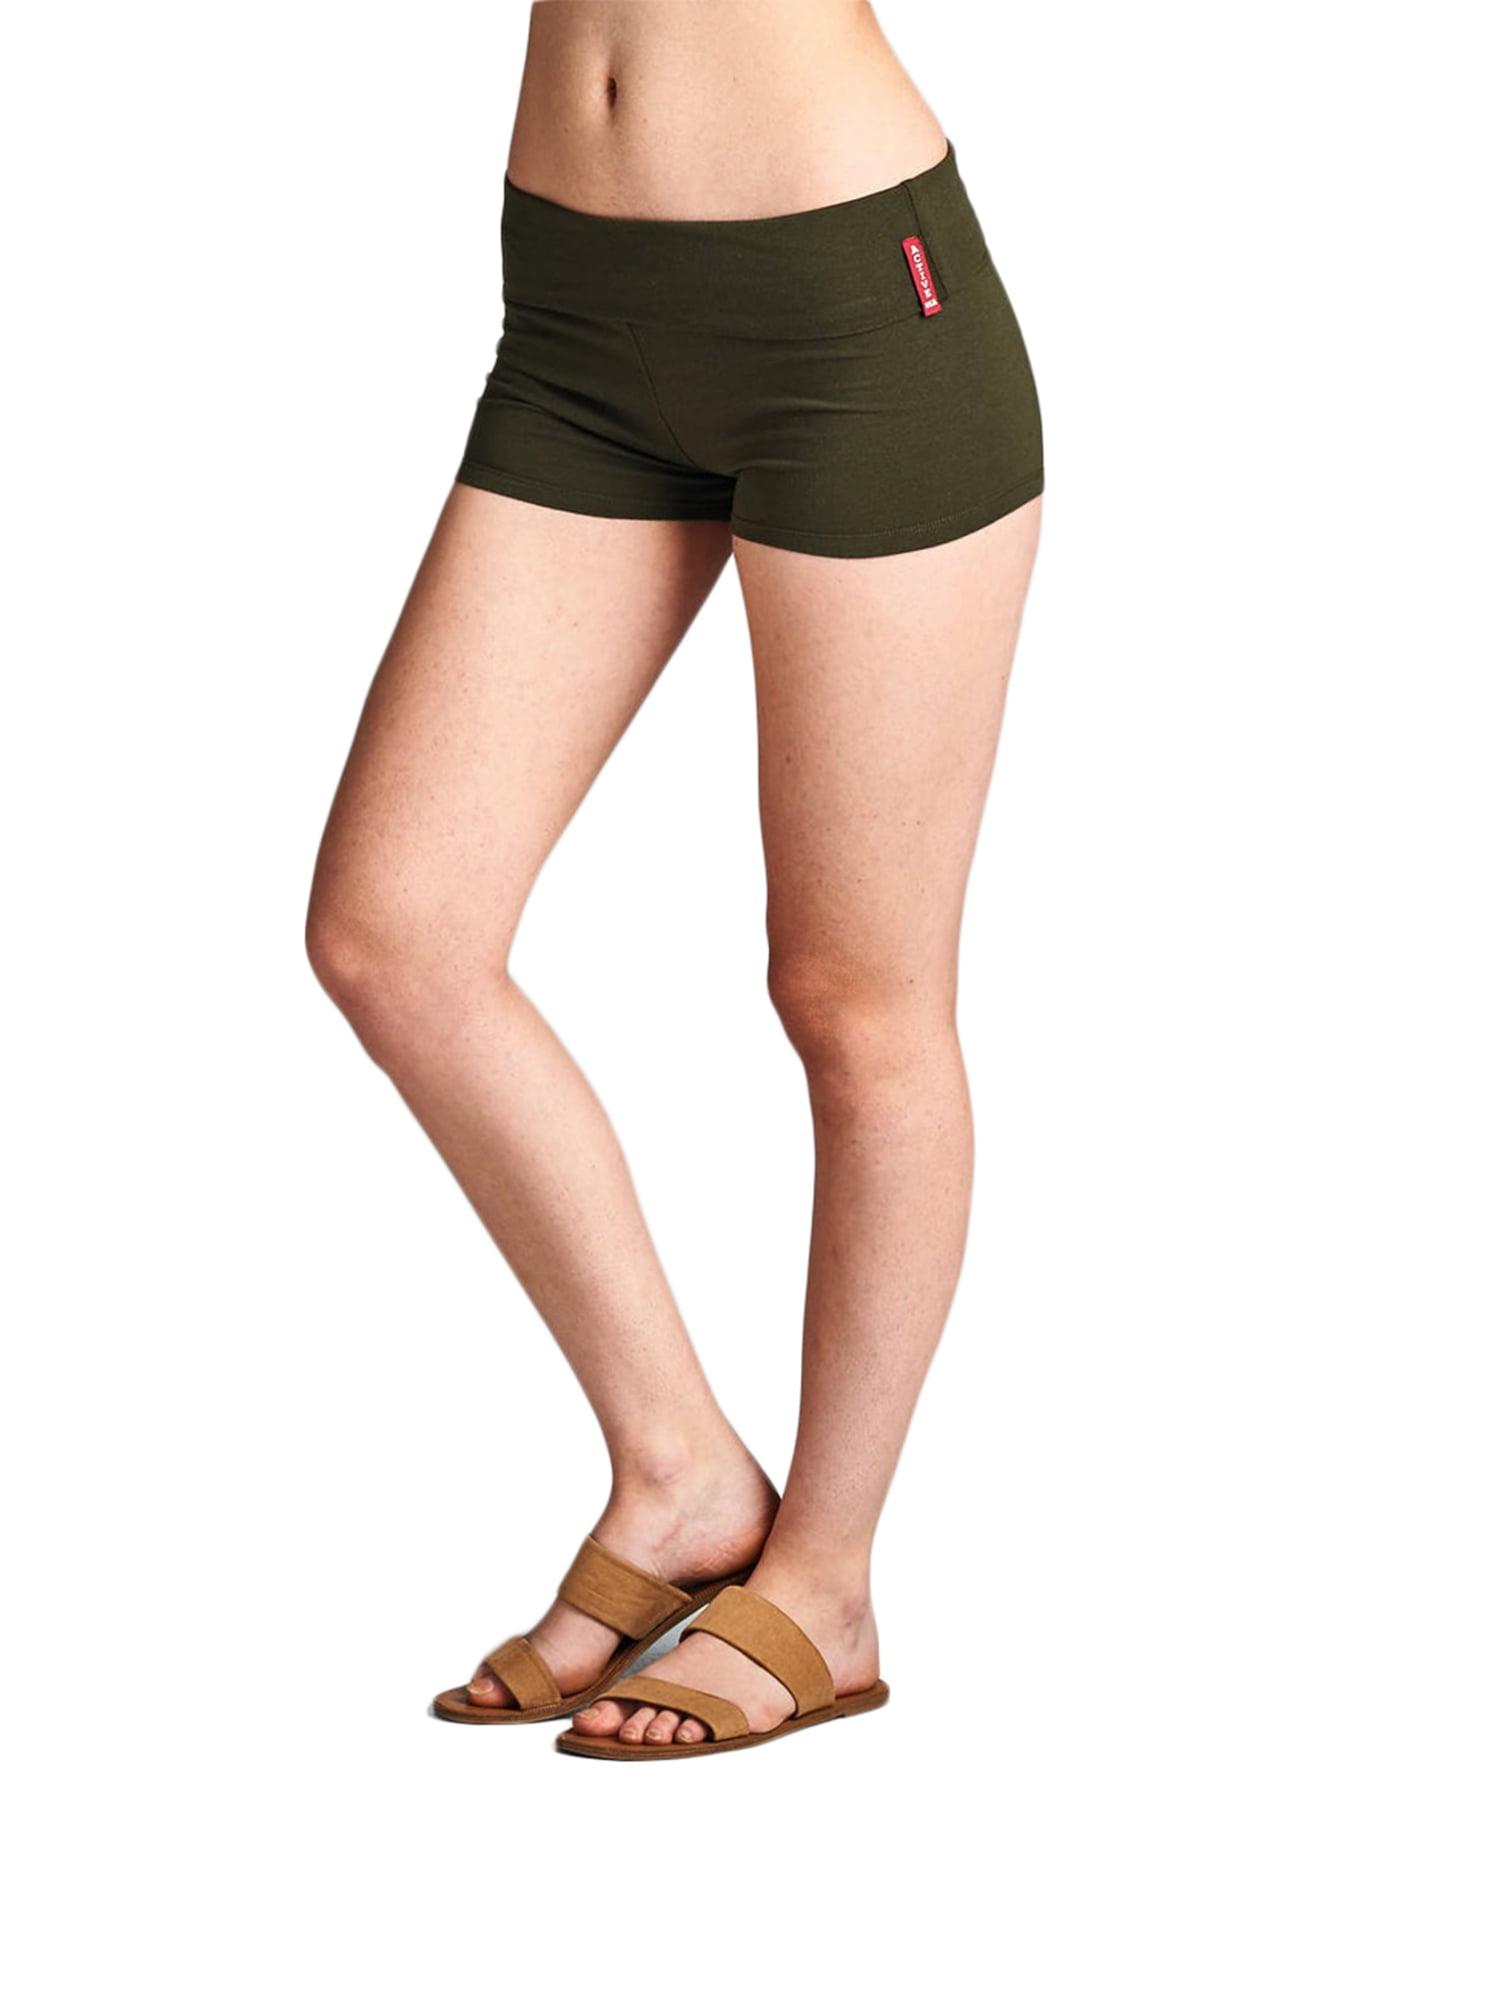 Essential Basic Junior Women Fold Over Low Rise Short Cotton Spandex Yoga Dance